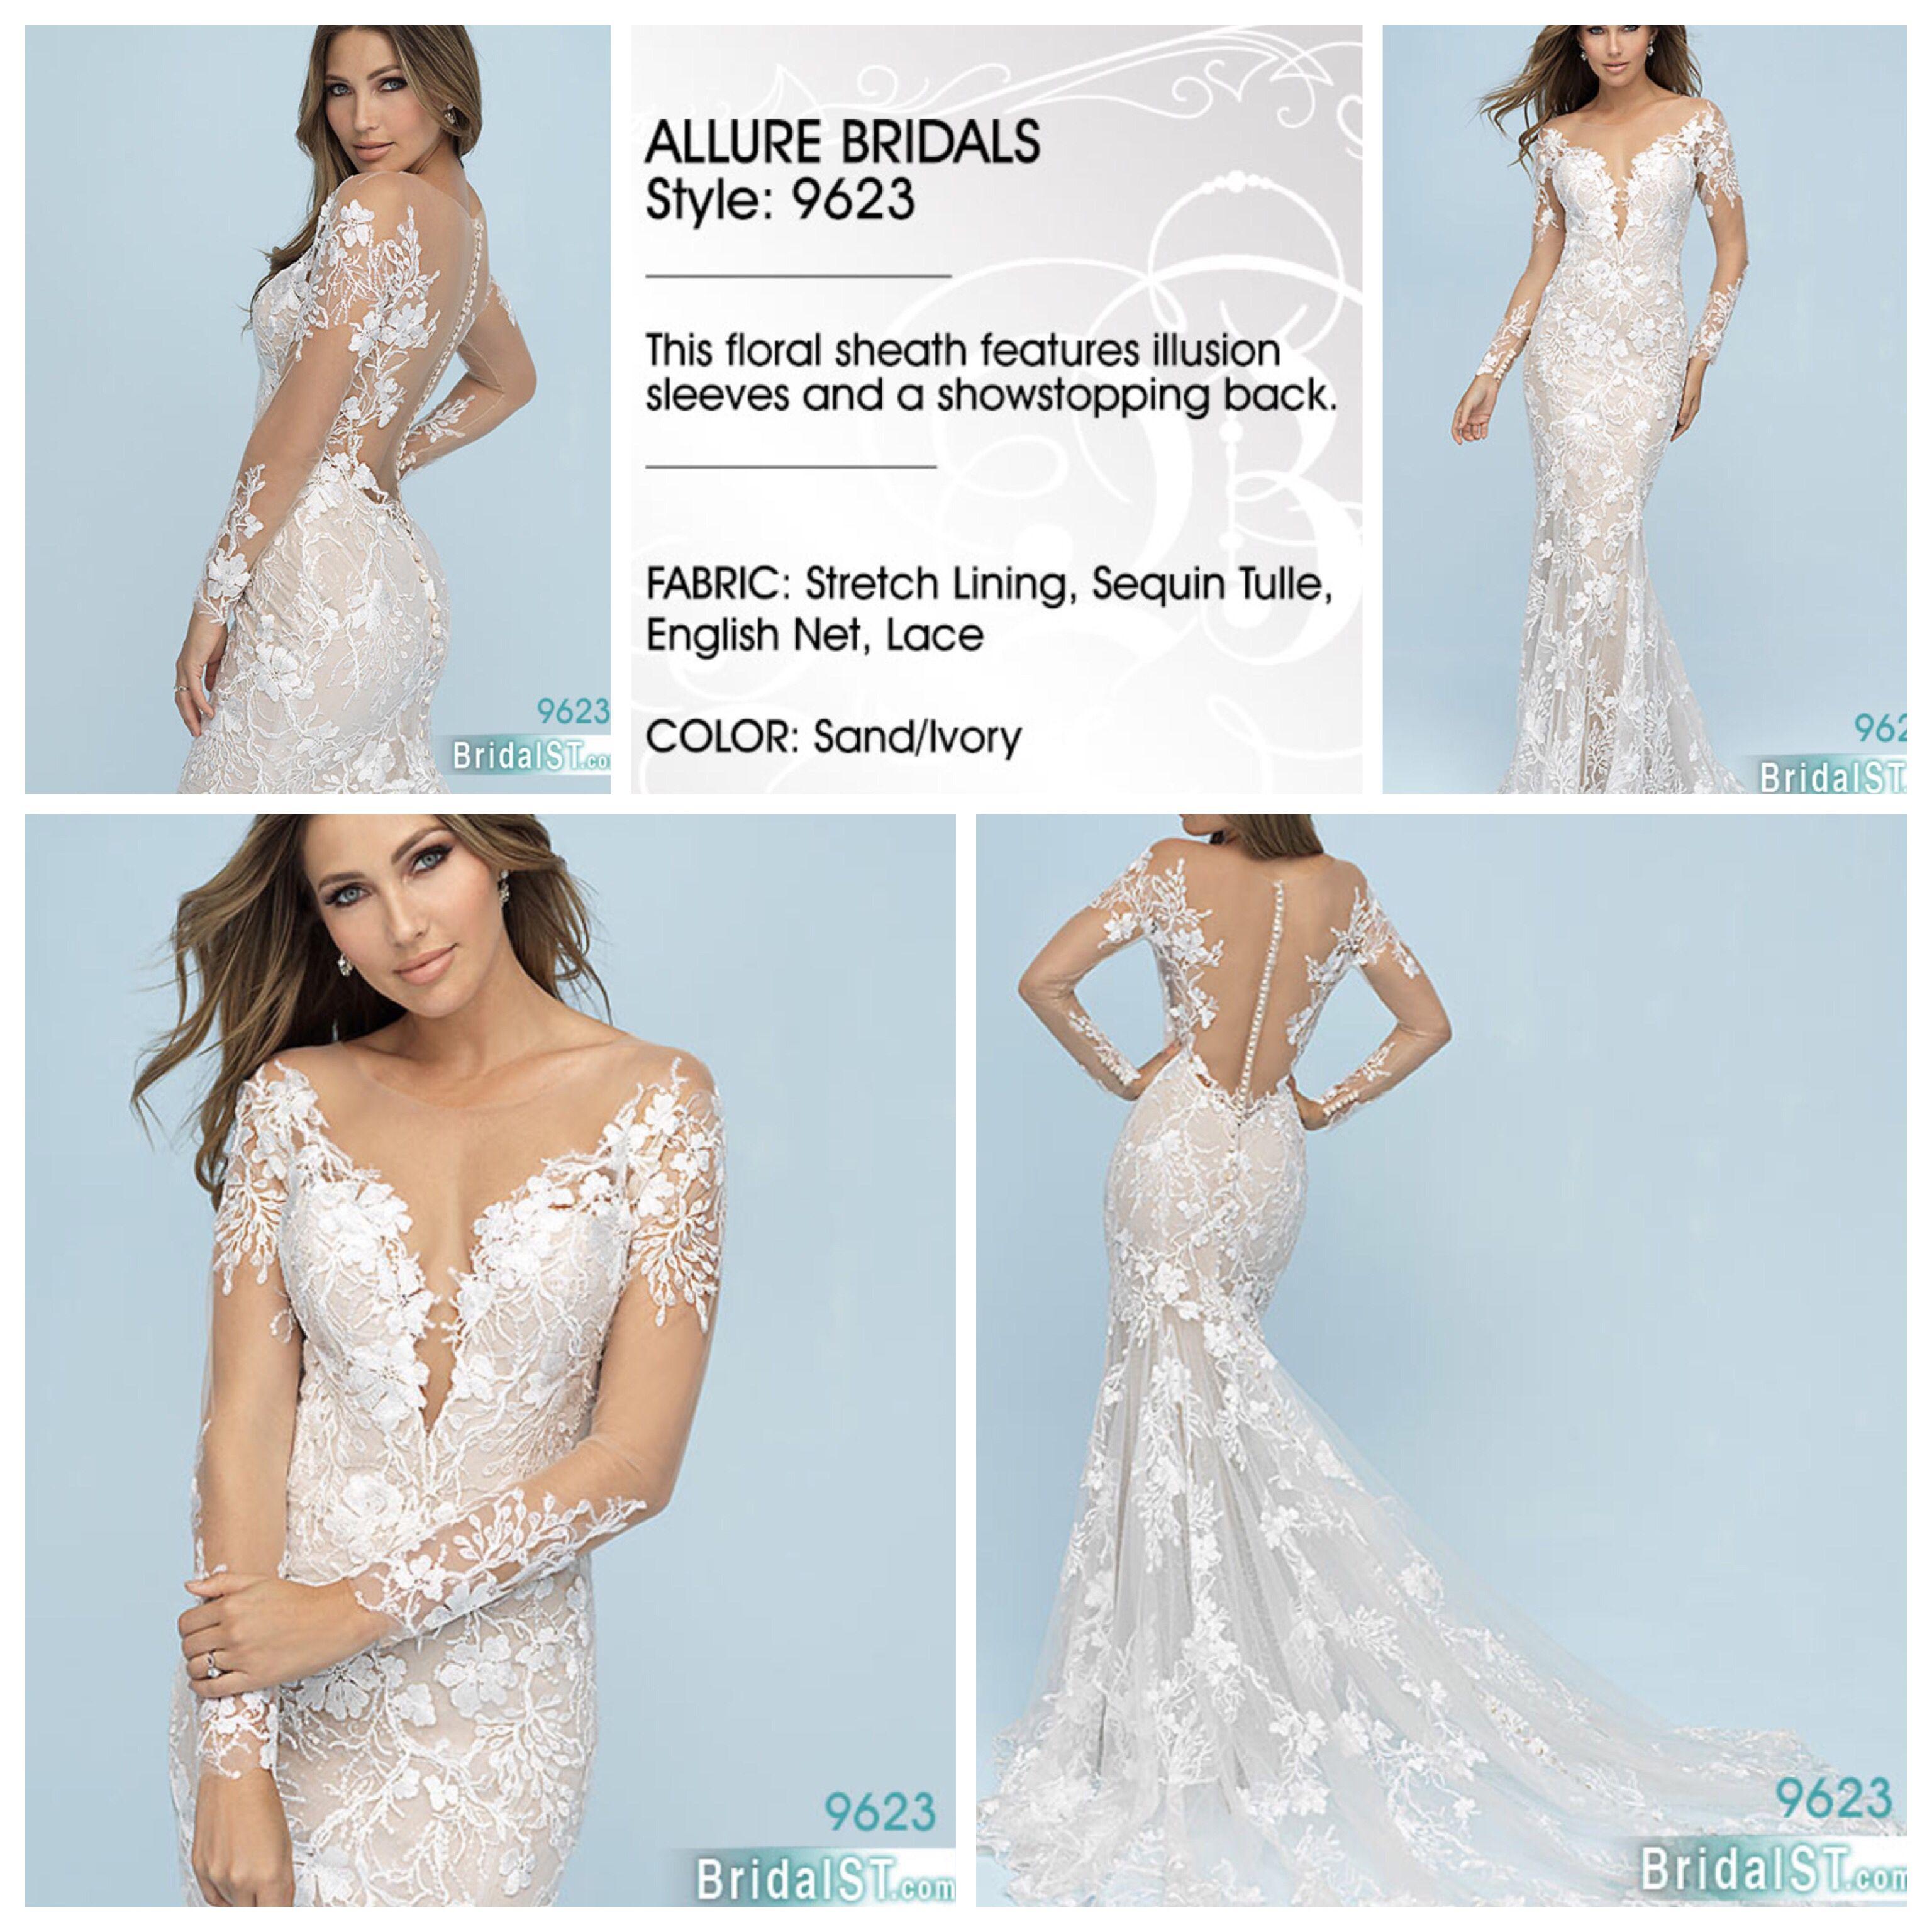 Allure Bridal 9623 Bridal And Special Times Allure Bridal Bridal Wedding Dresses Lace